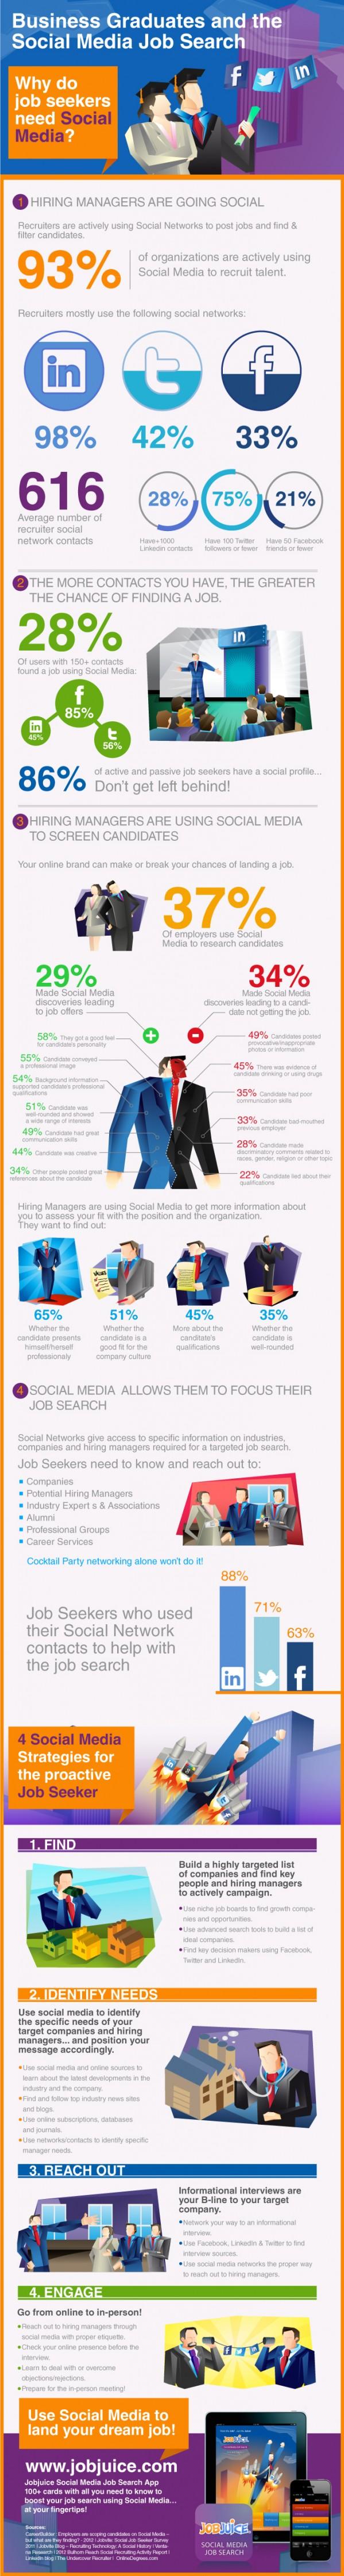 socialmediaforjobseekers